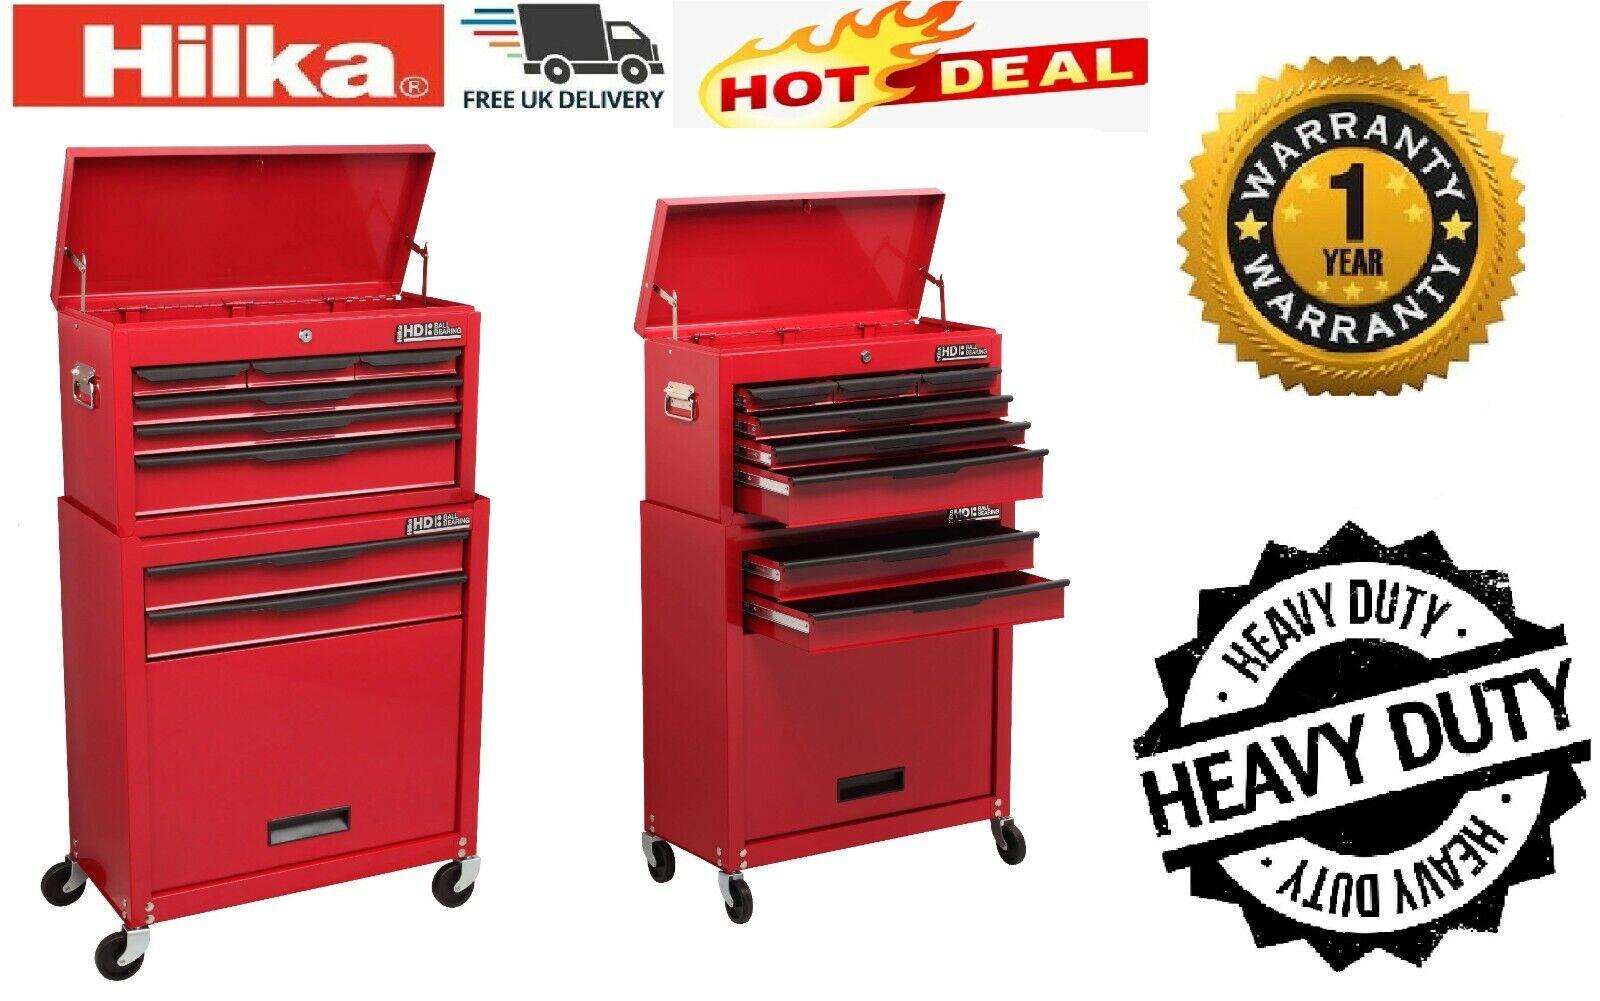 Hilka Heavy Duty 3 Drawer Add-On Tool Chest Bbs Red Craft Steel Type Storage